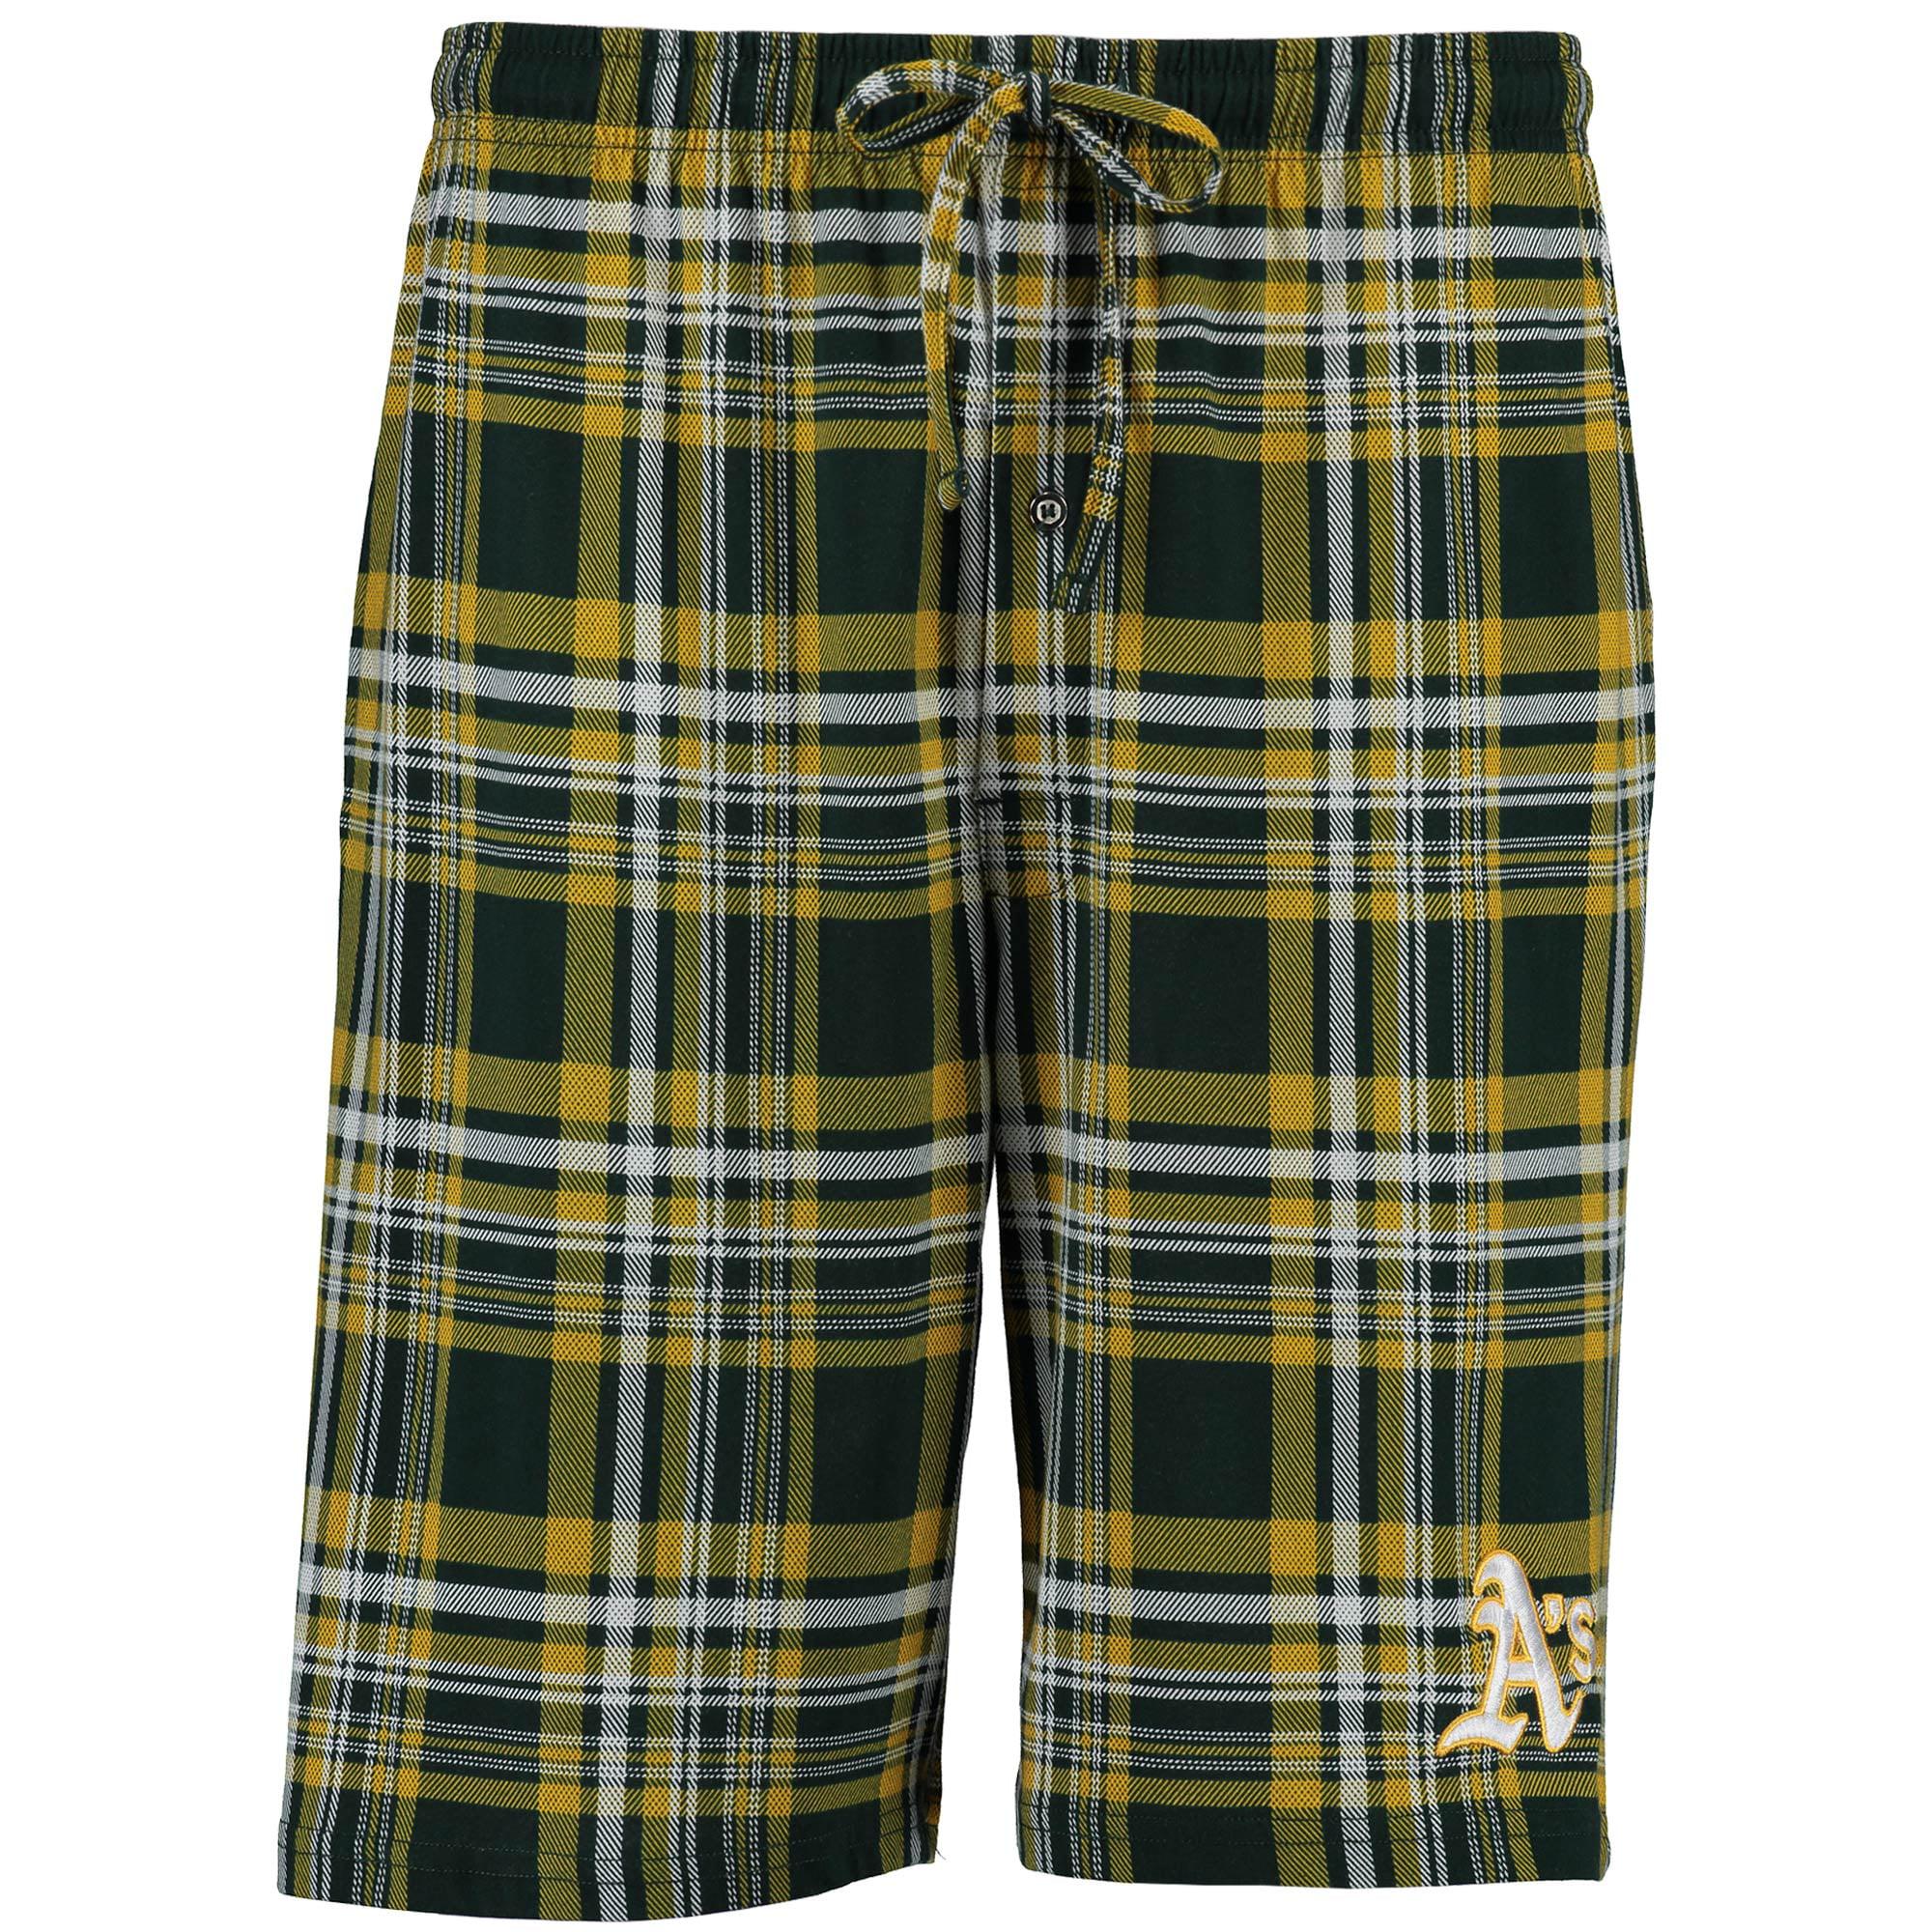 Oakland Athletics Concepts Sport Formation Plaid Shorts - Green